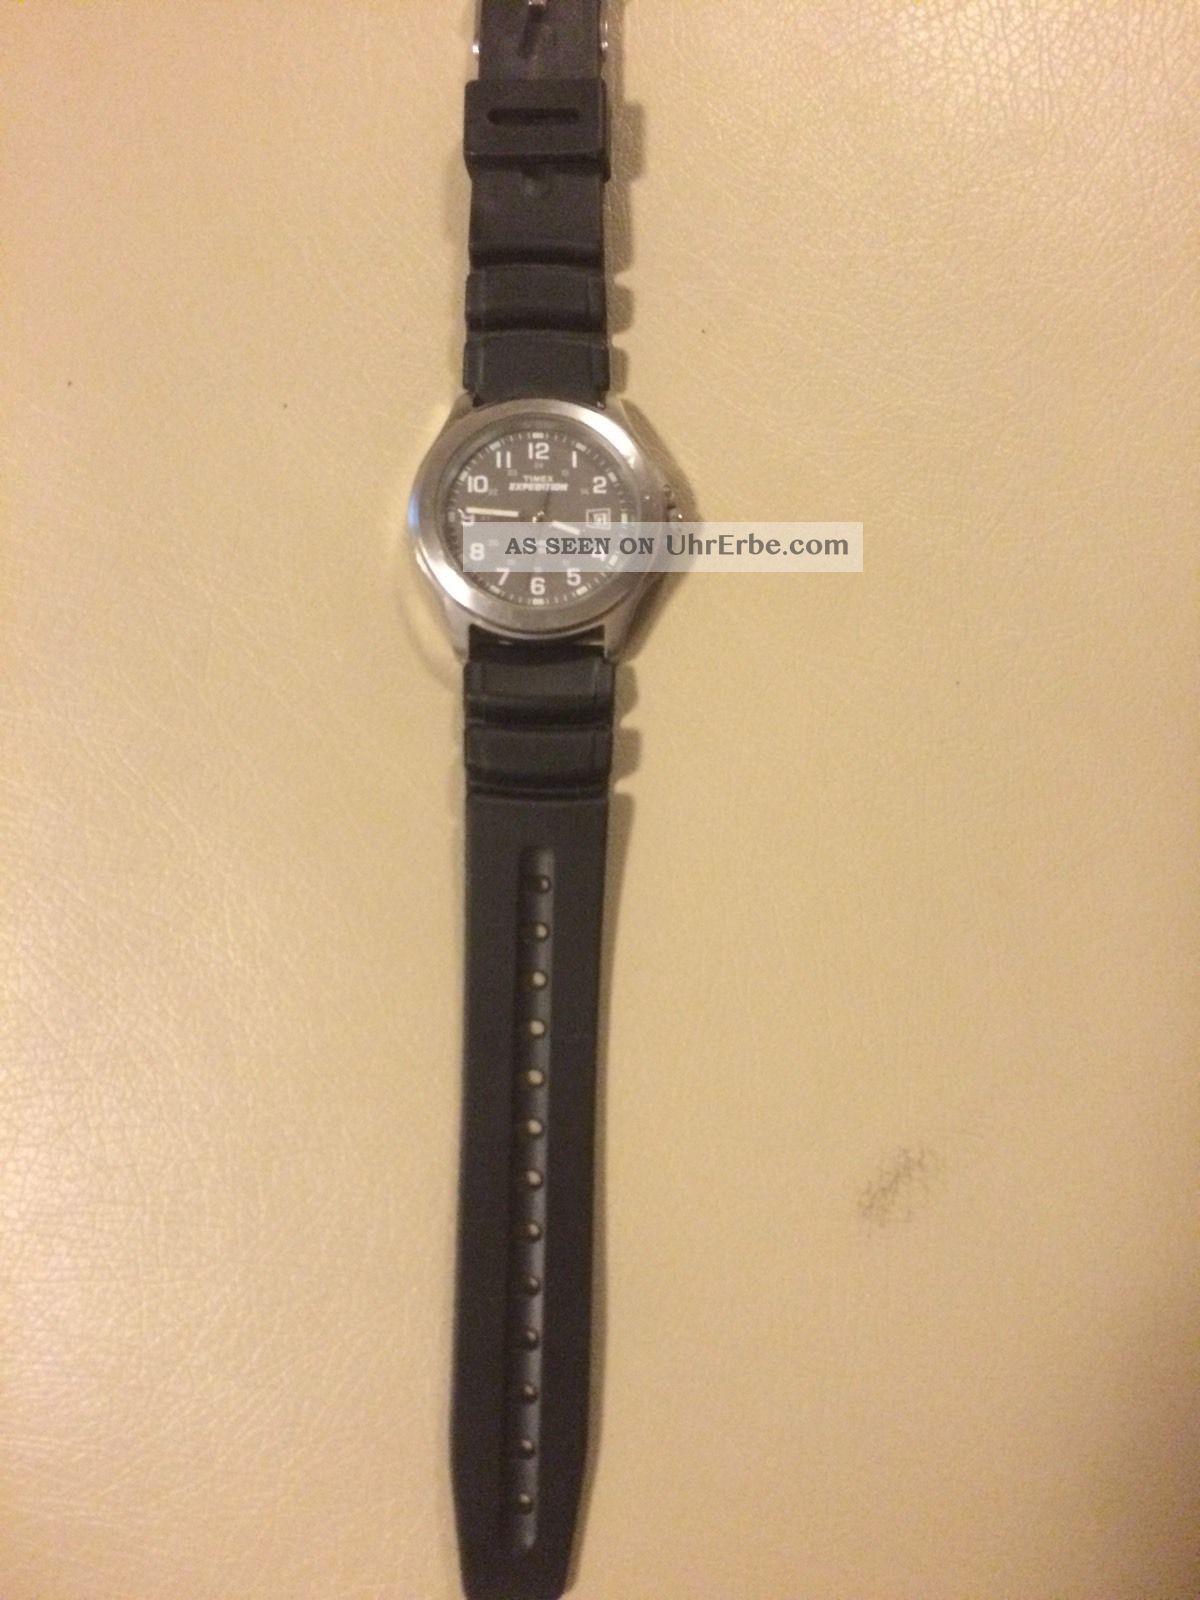 Timex Expedition Armbanduhren Bild